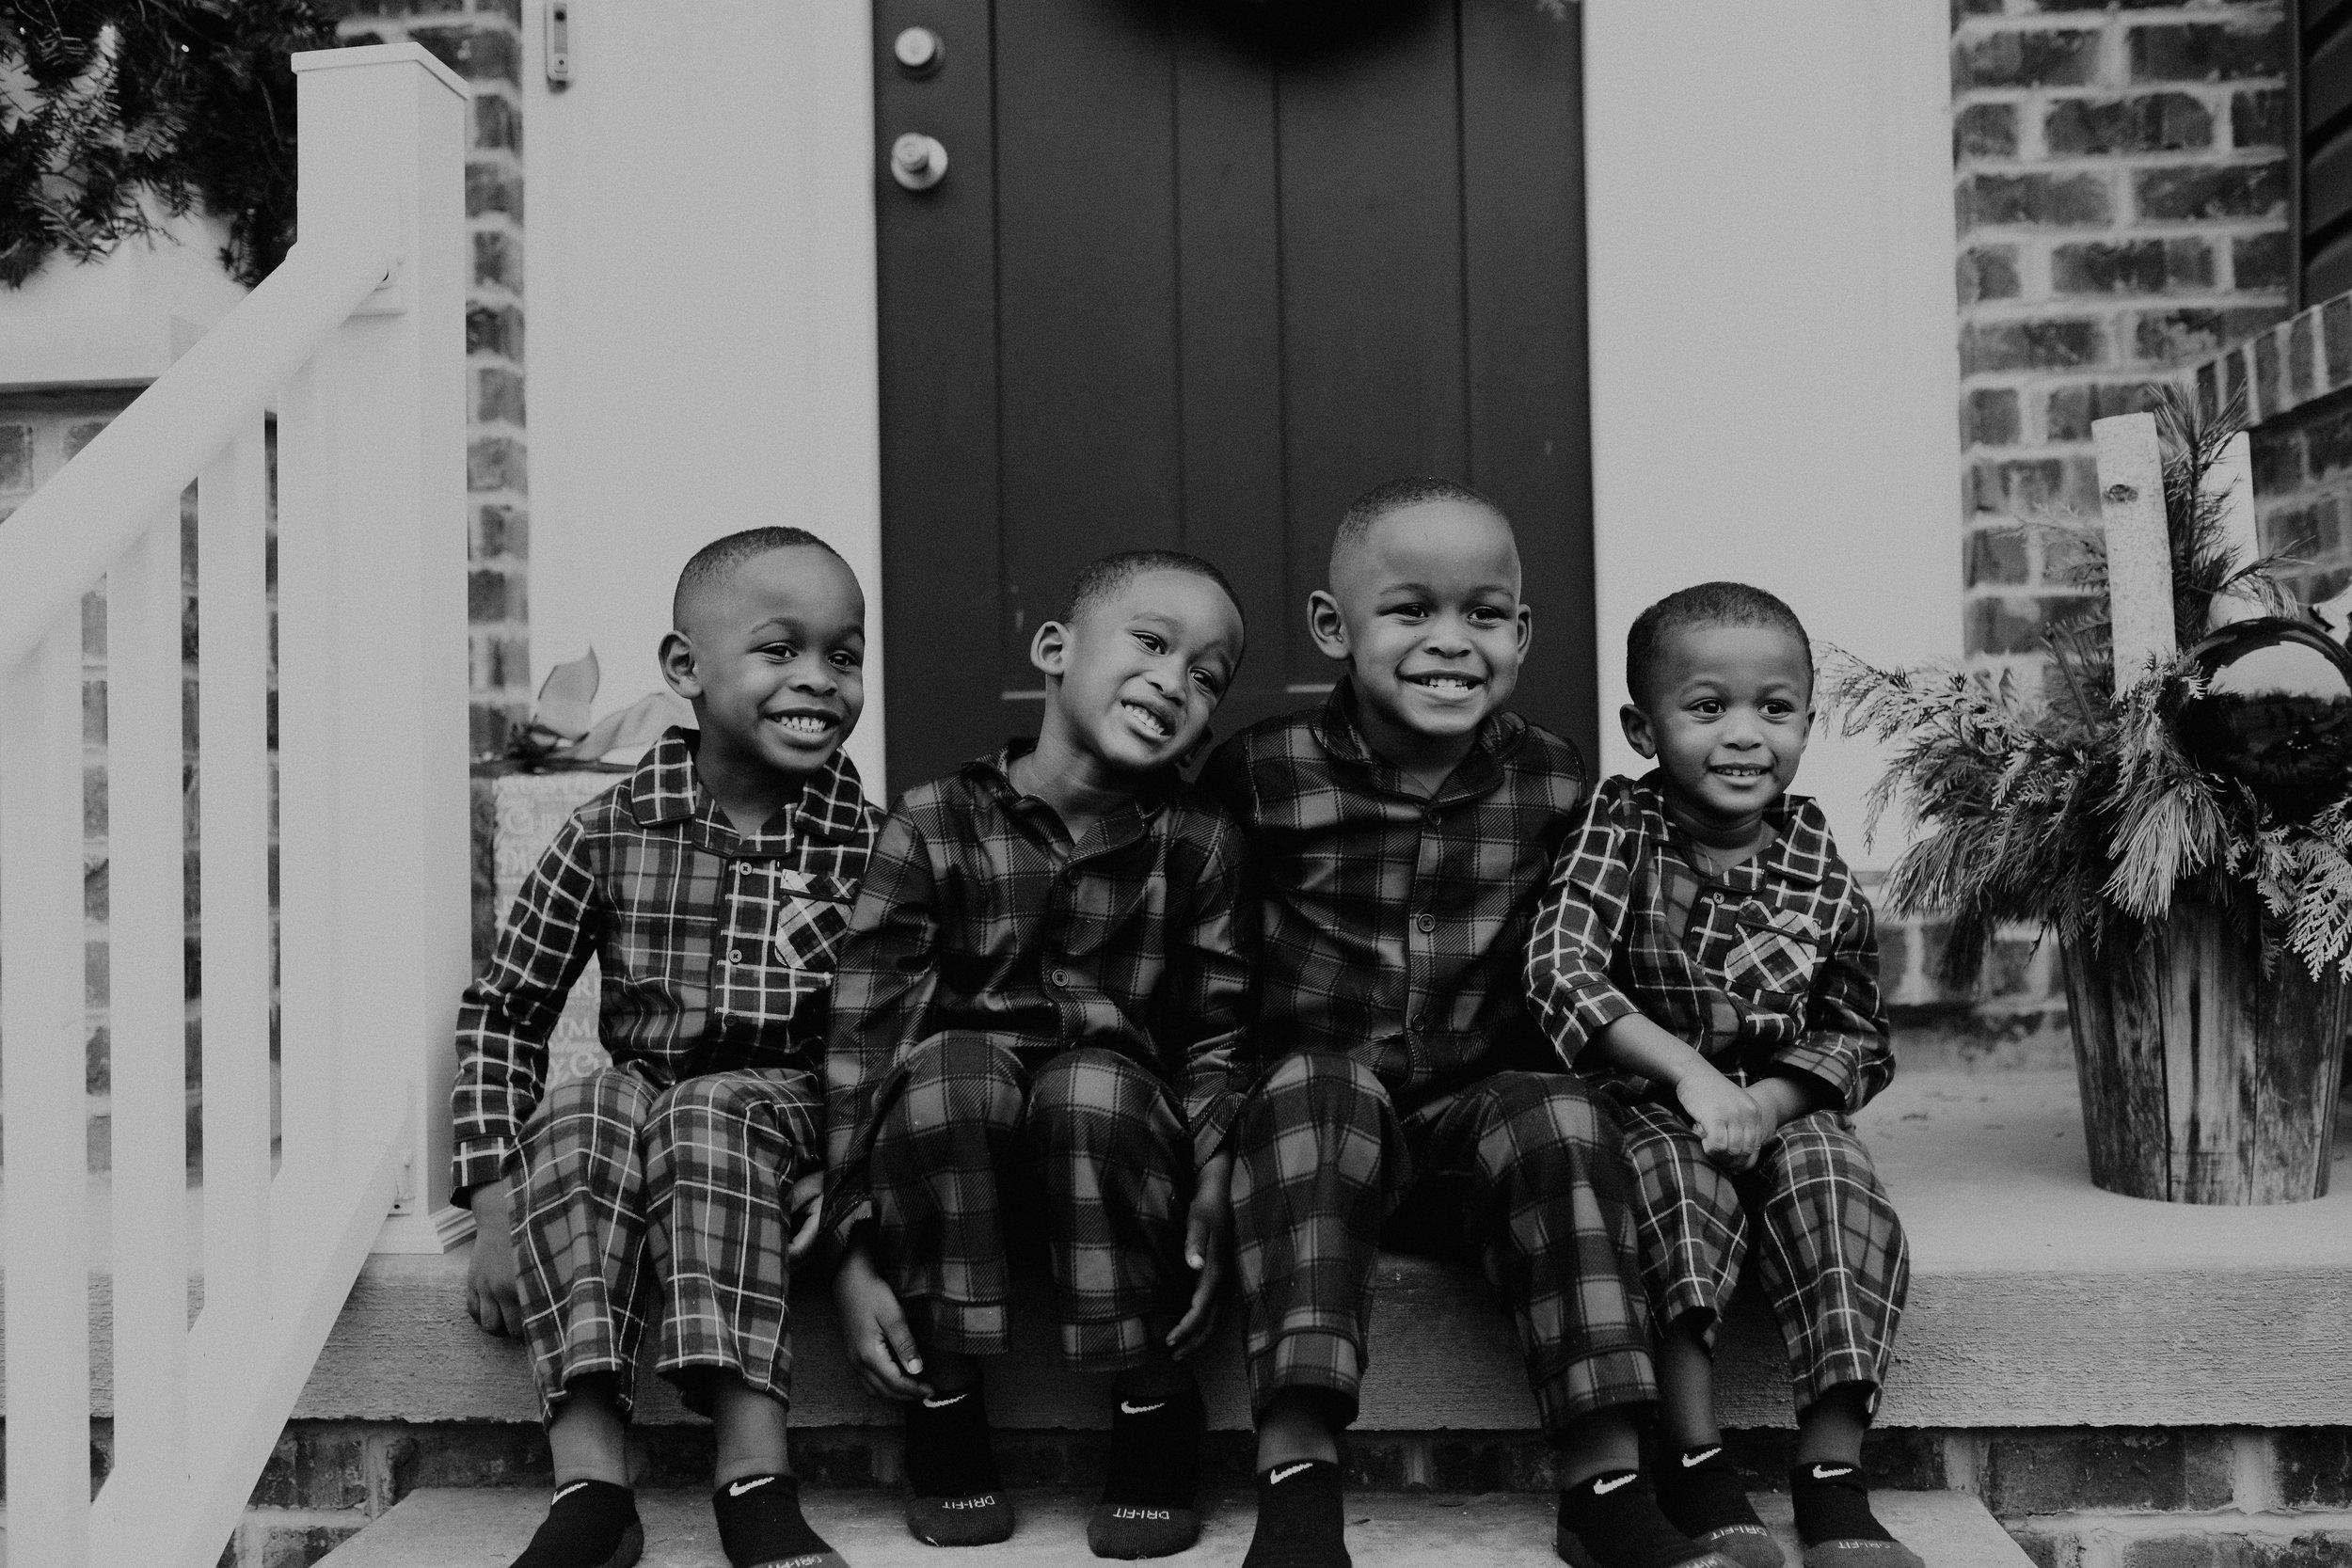 Boys Christmas 99 (1 of 1).jpg